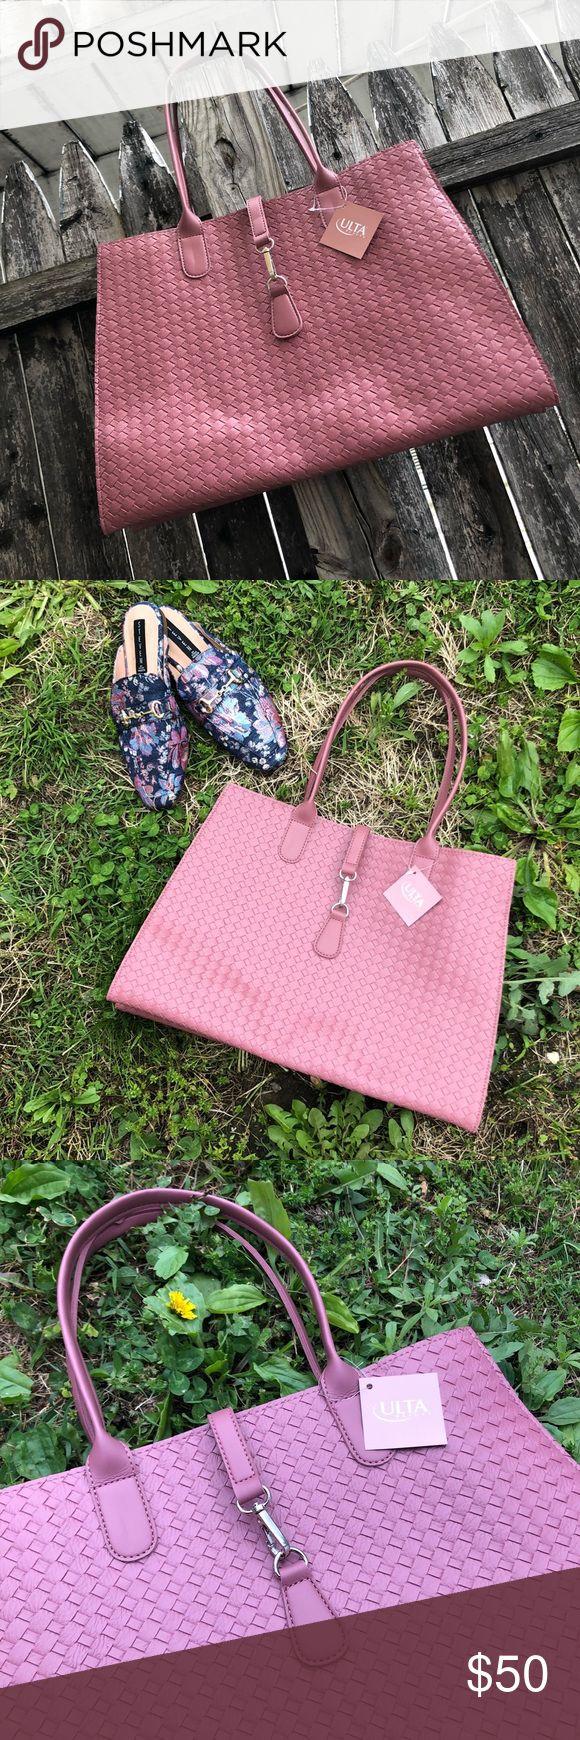 Mauve Pink Tote Bag NWT Ulta  Mauve Pink Tote Bag  Basket Weave Fashion Textured F…